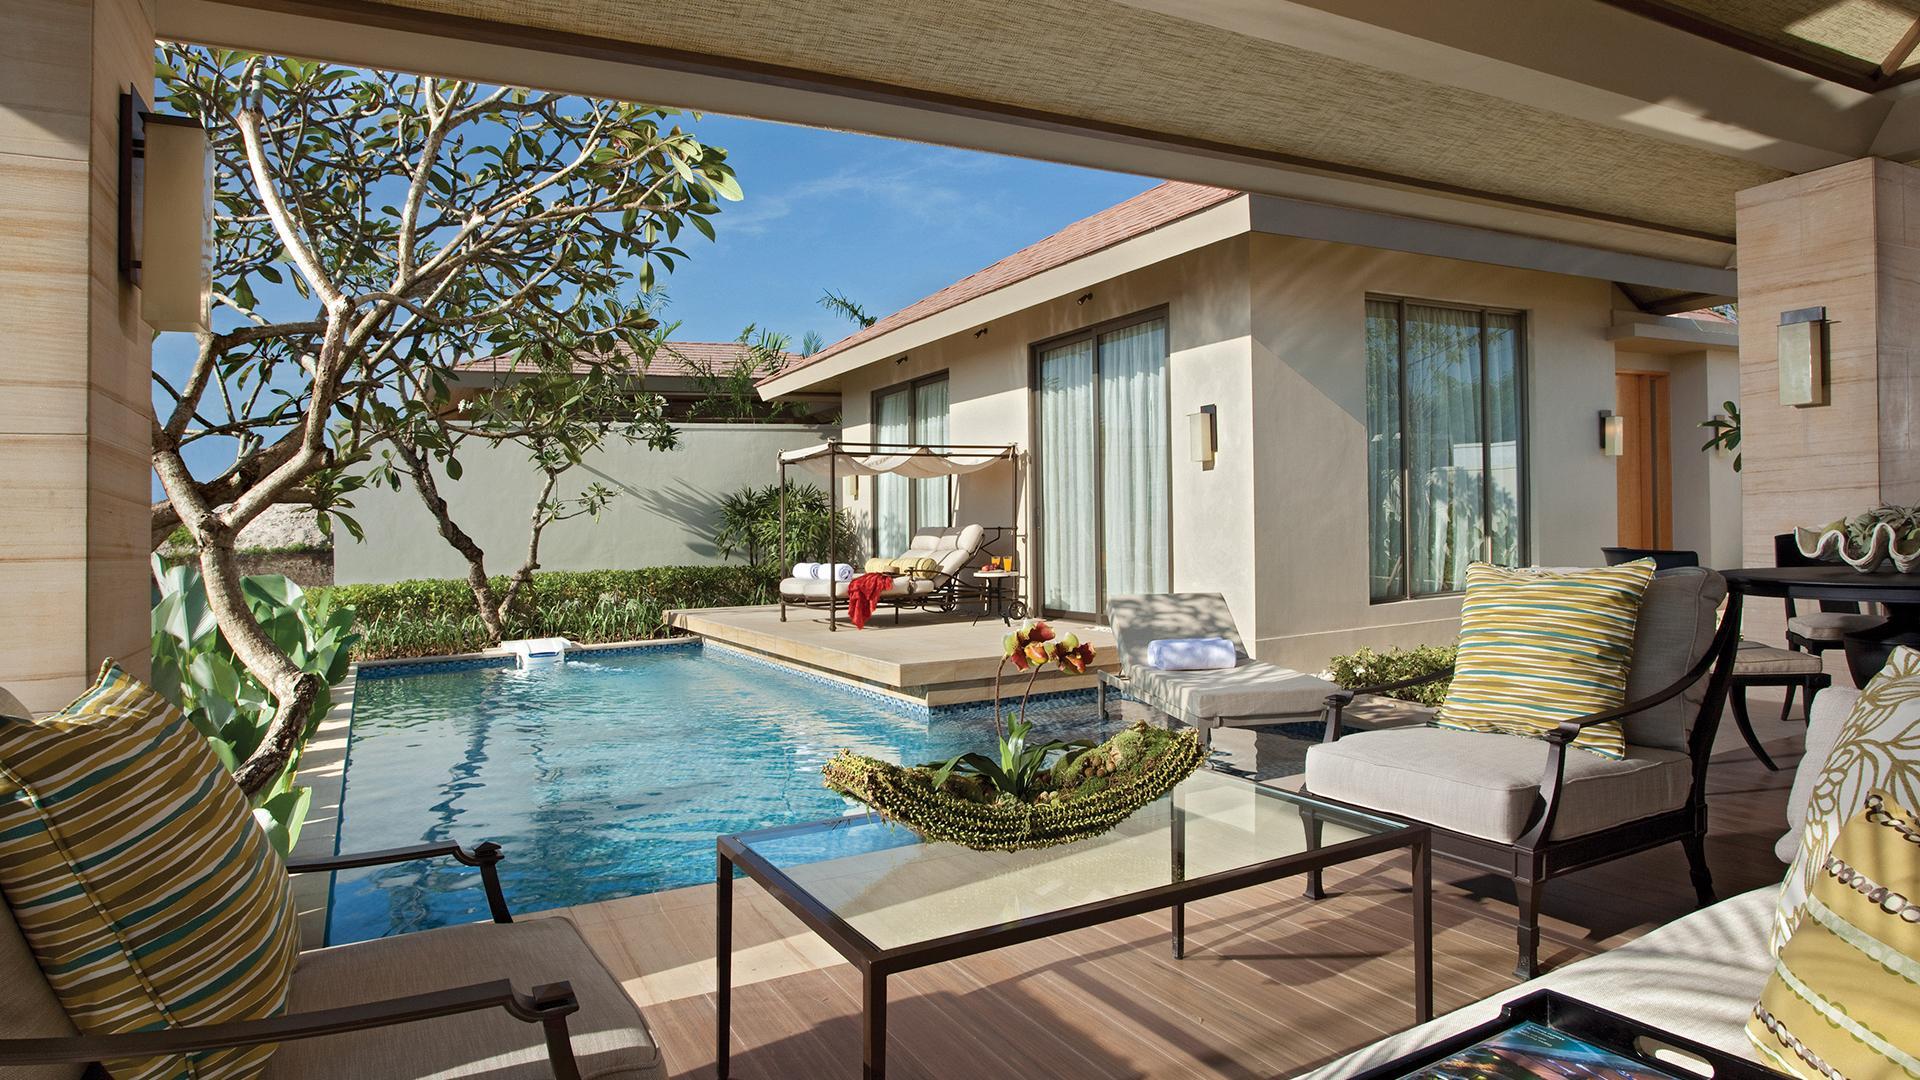 One Bedroom Garden Pool Villa image 1 at Mulia Villas by Kabupaten Badung, Bali, Indonesia